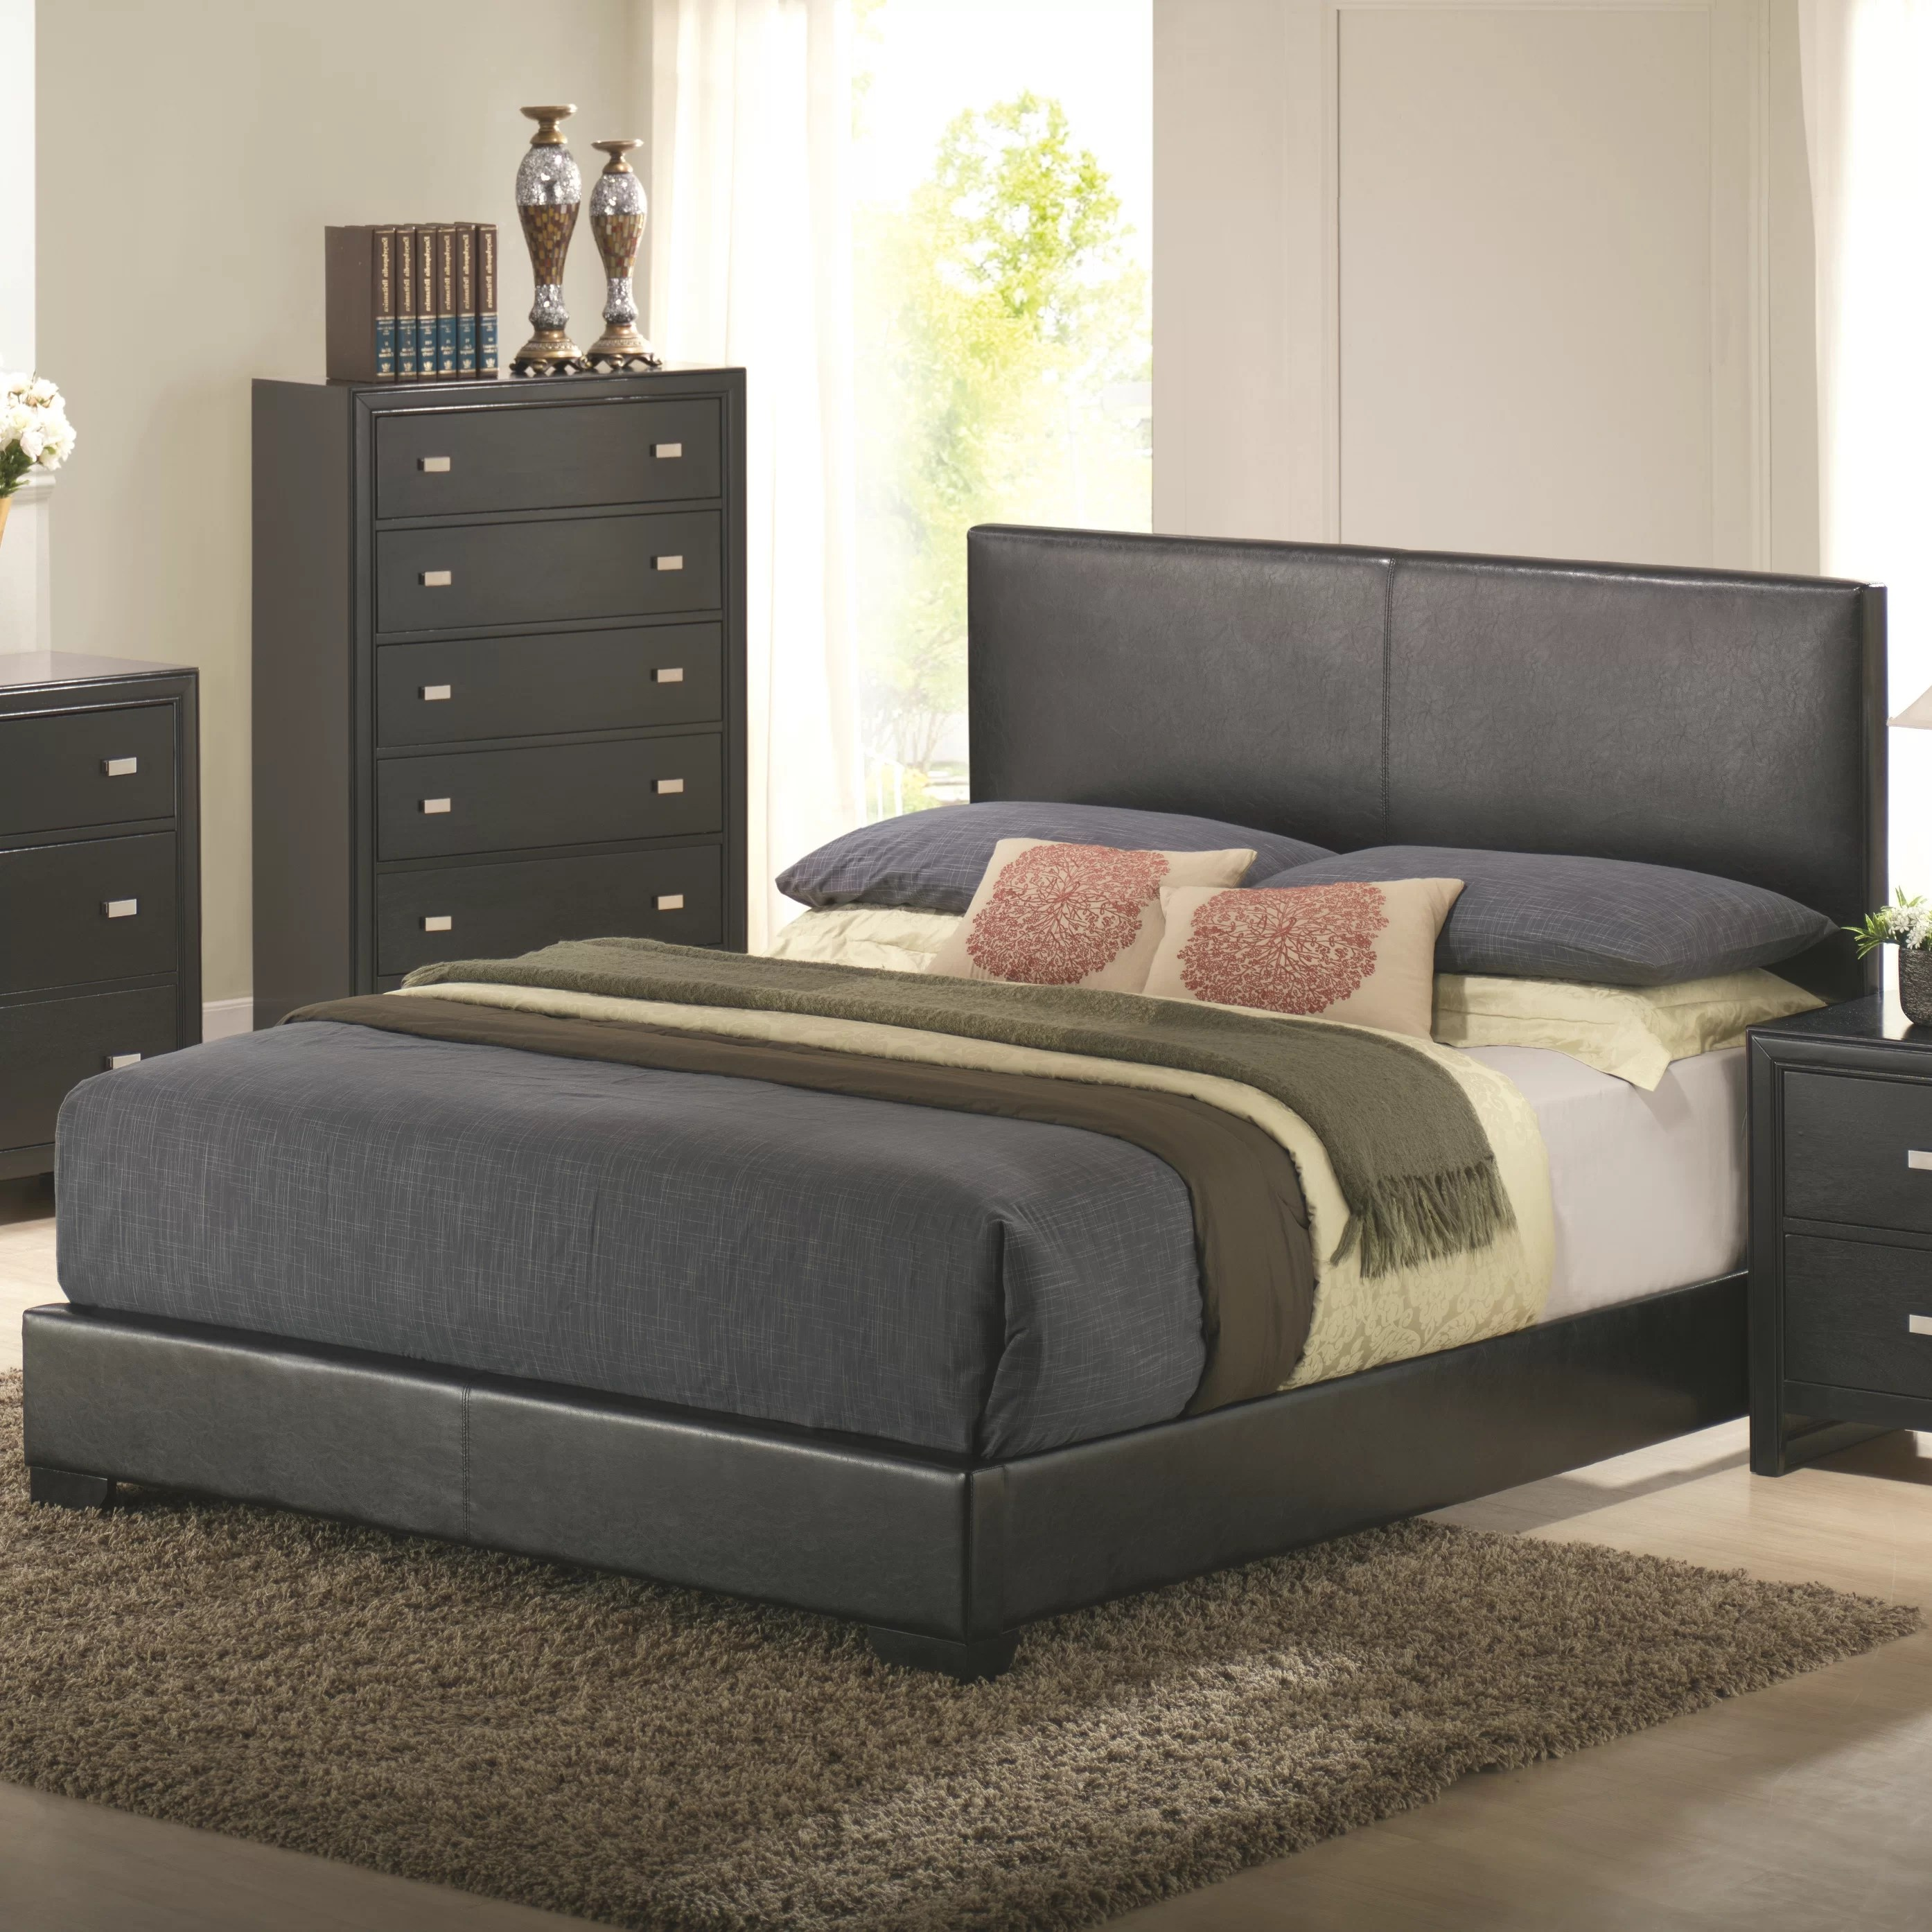 bedroom chair wayfair folding price in india wildon home  kaspa queen platform customizable